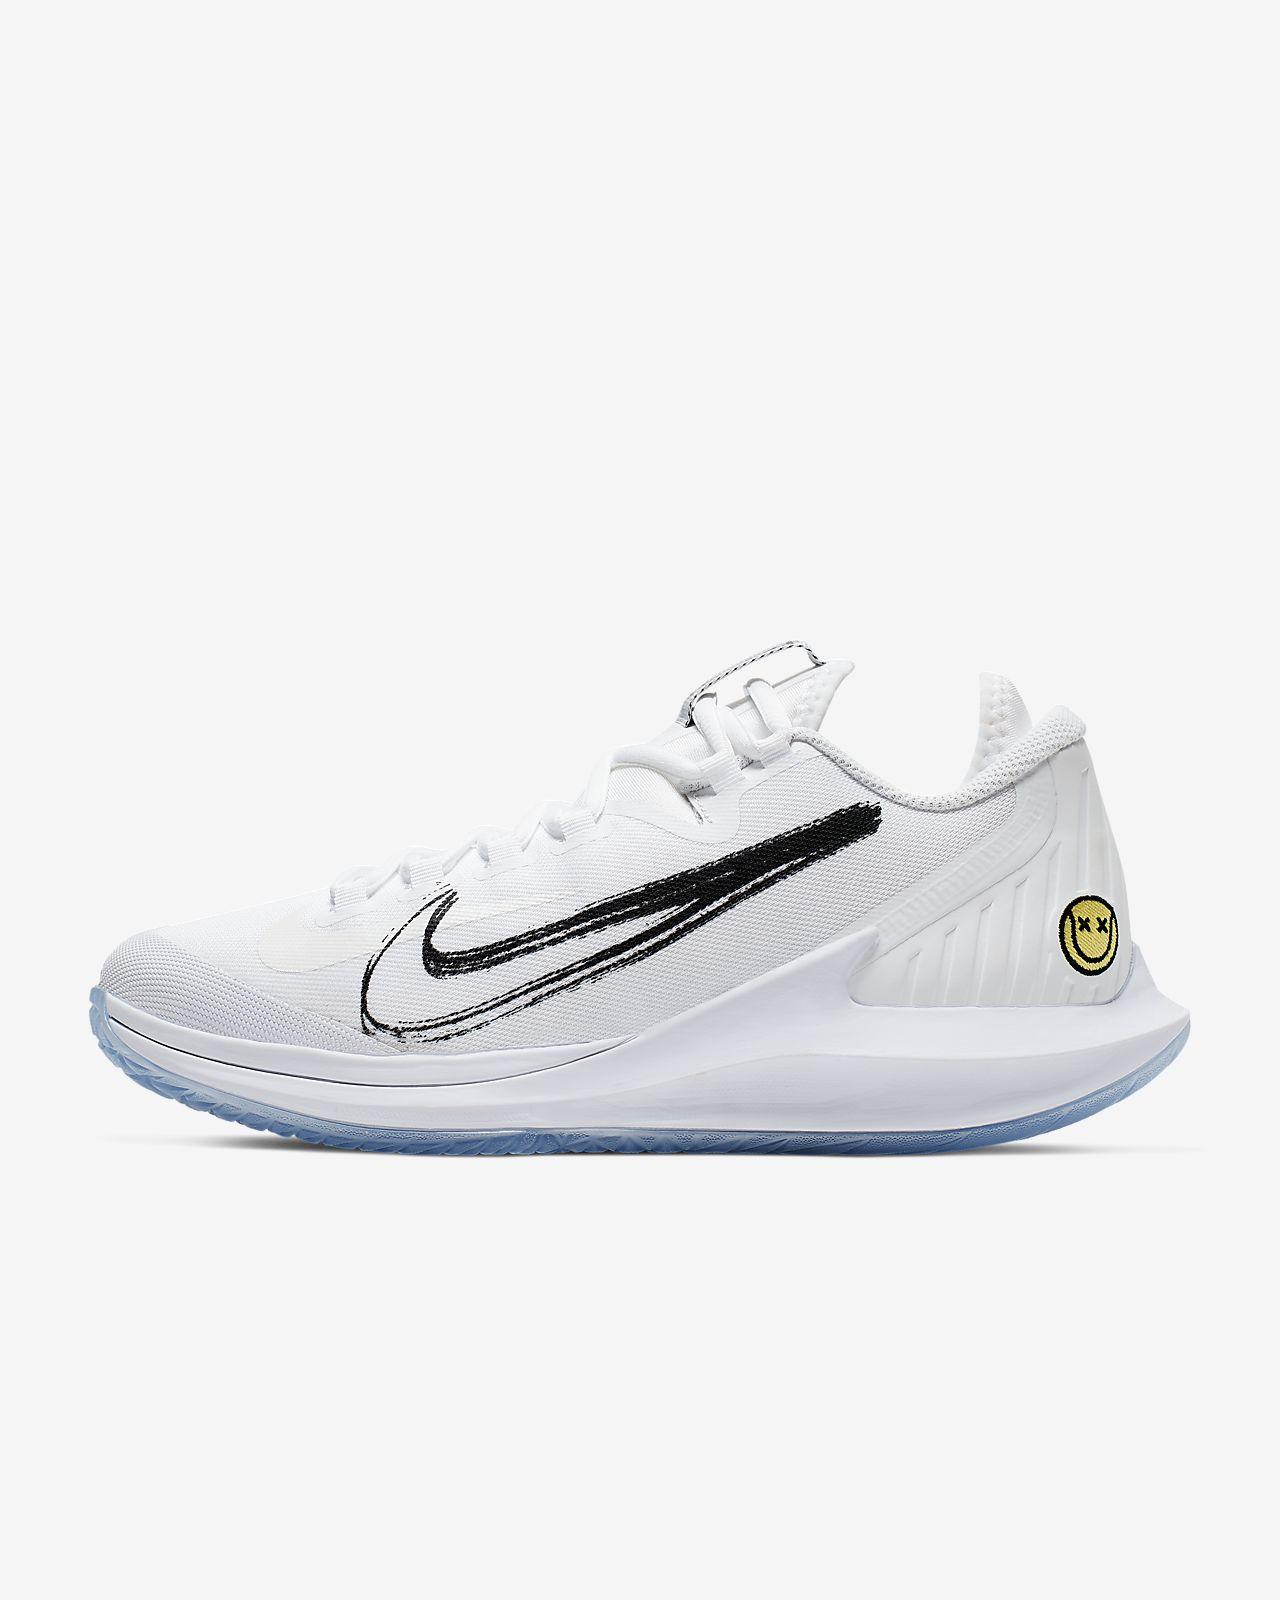 competitive price 4bbbe 65586 NikeCourt Air Zoom Zero Women's Tennis Shoe